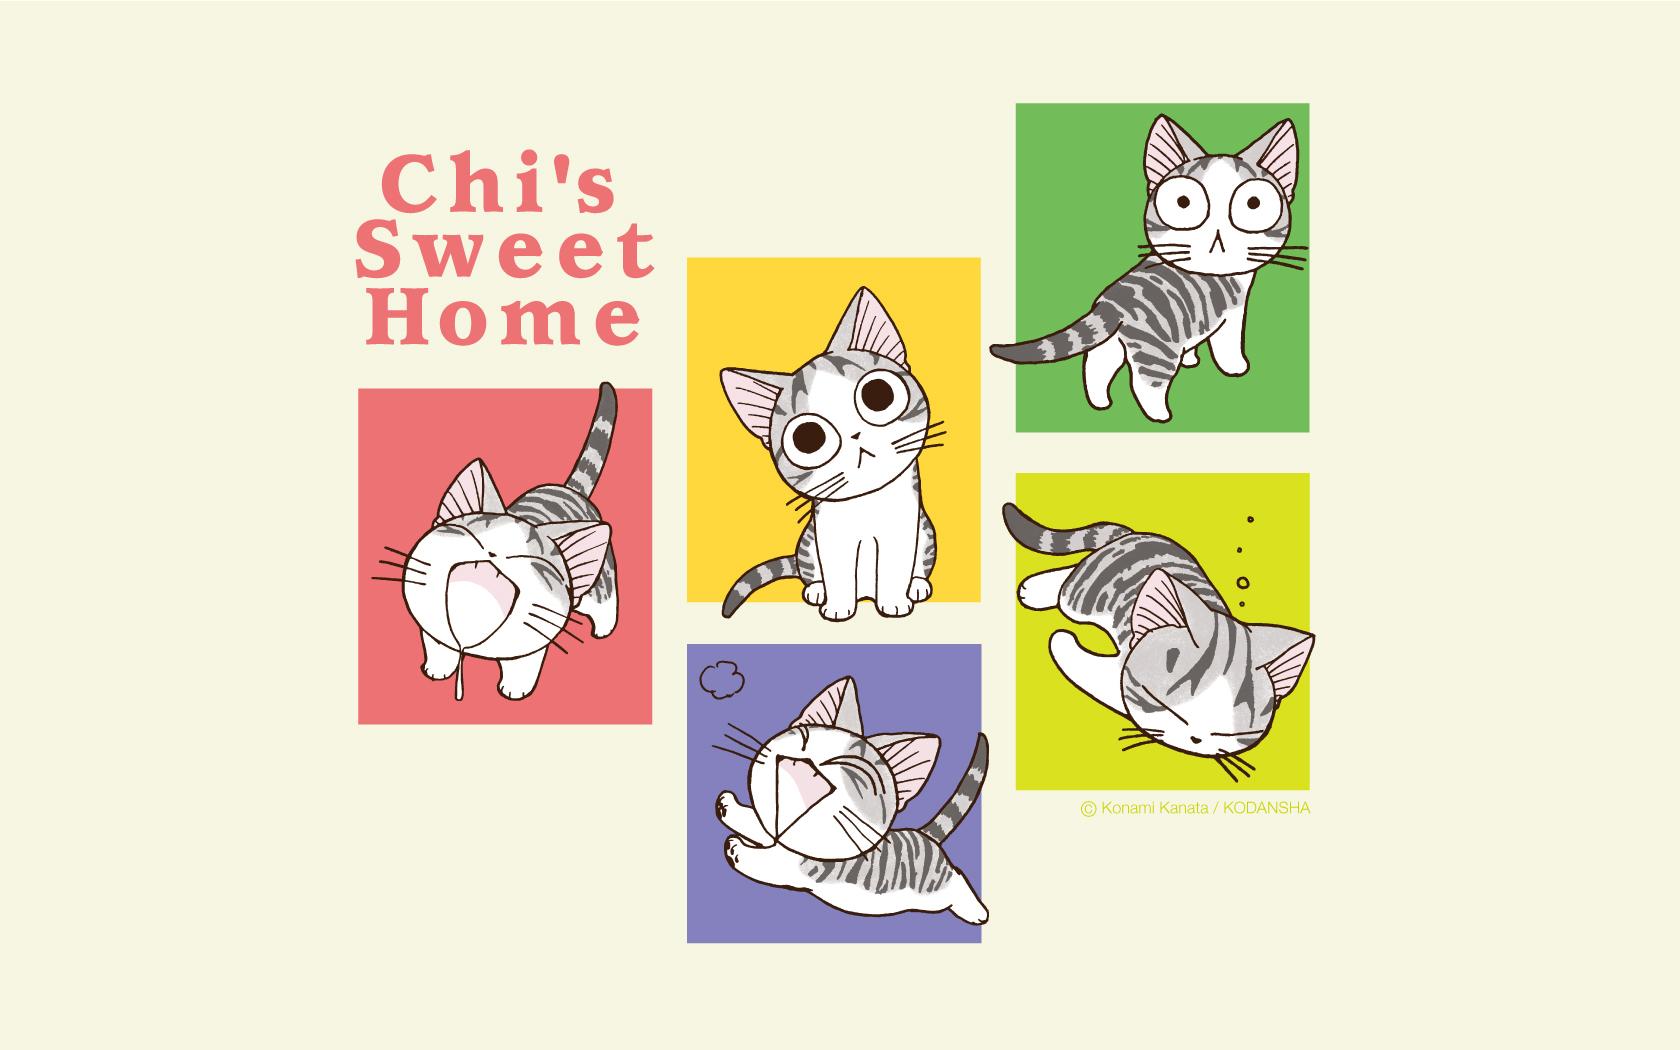 Chi's Sweet Home wallpaper ile ilgili görsel sonucu